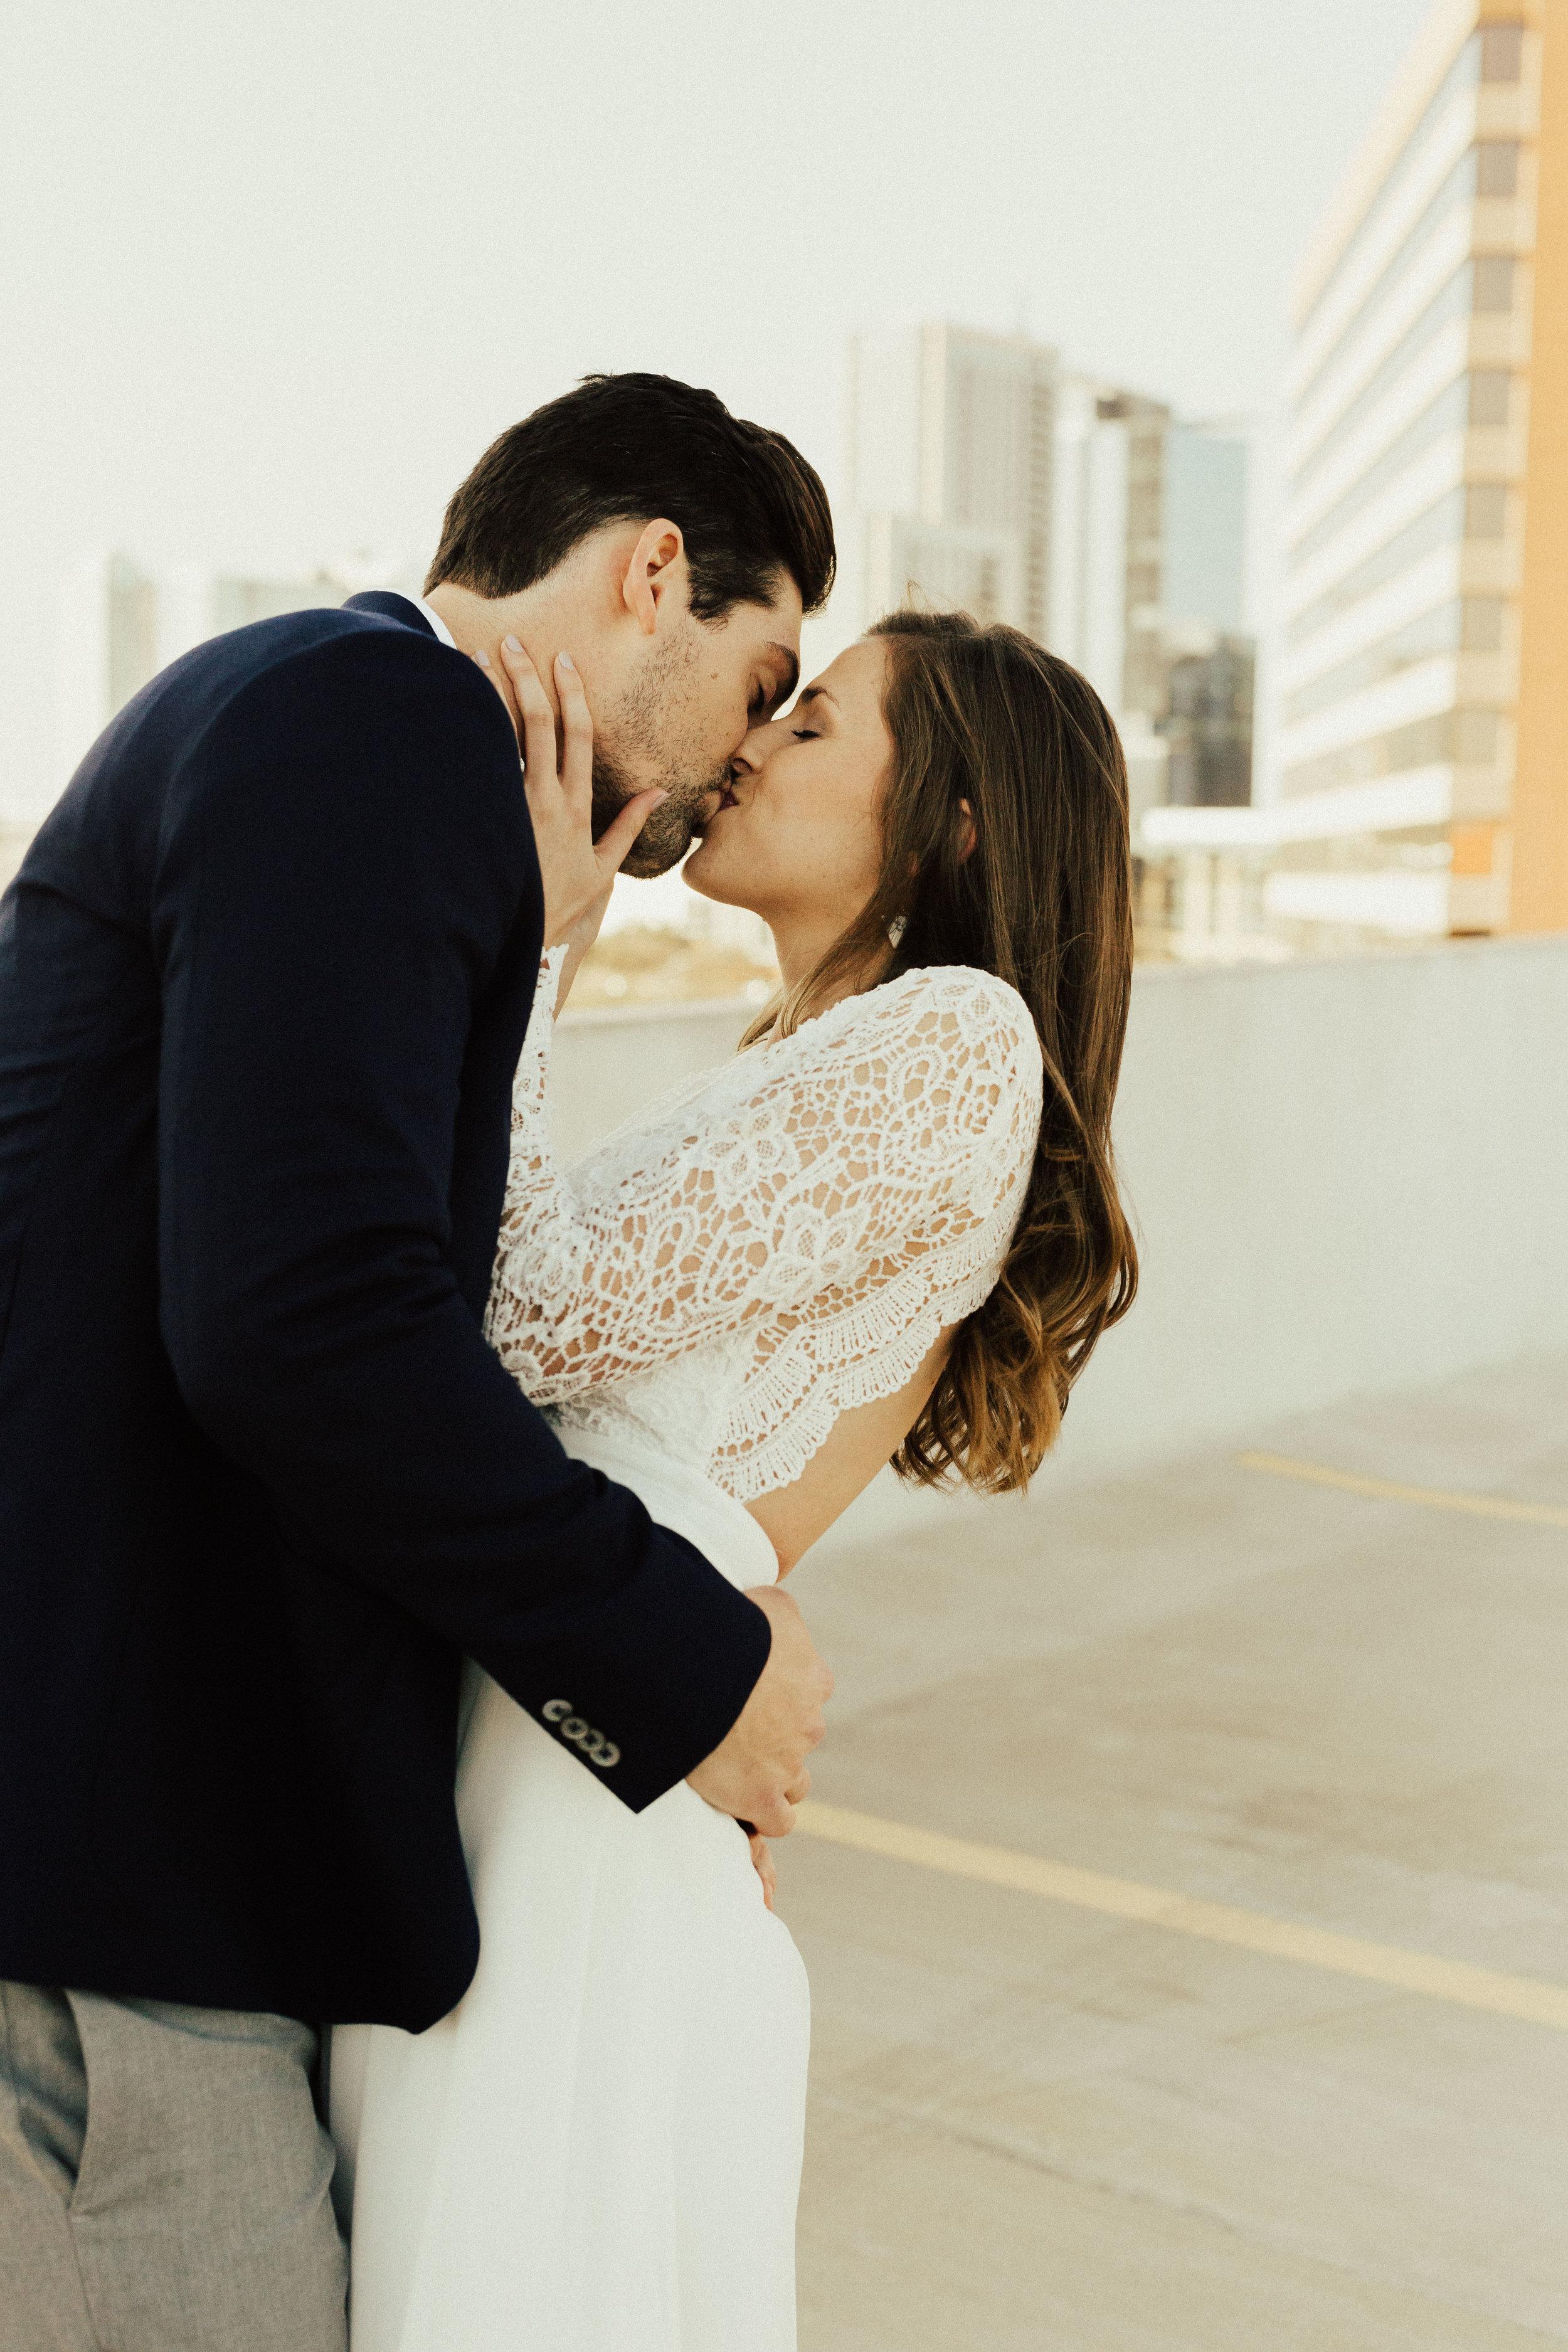 Morgan -Christian-Engagements-Austin-texas-skyline-Emma-Long-Metropolitan-Park-texas-photographer-21